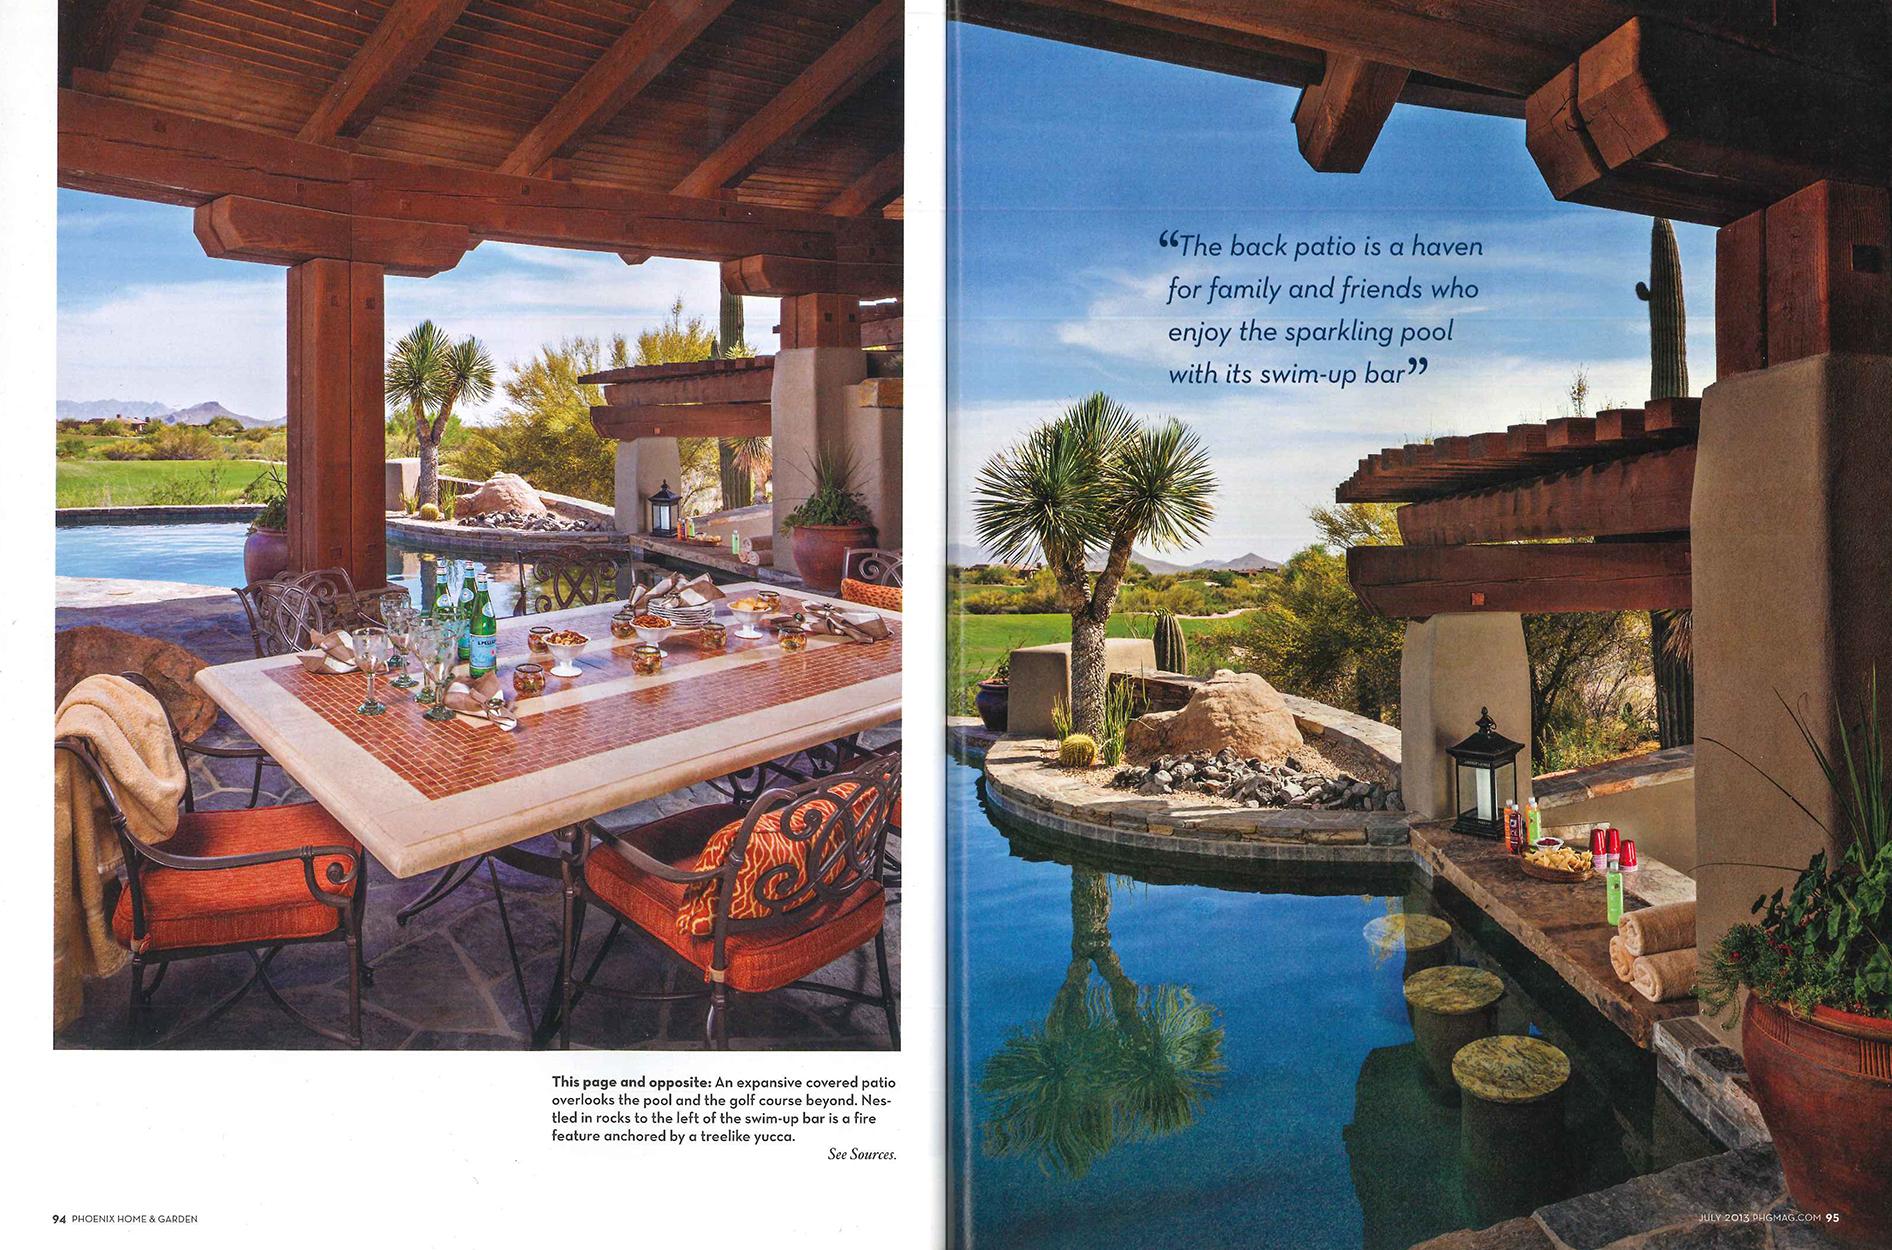 Phoenix Home & Garden, Curve Appeal article